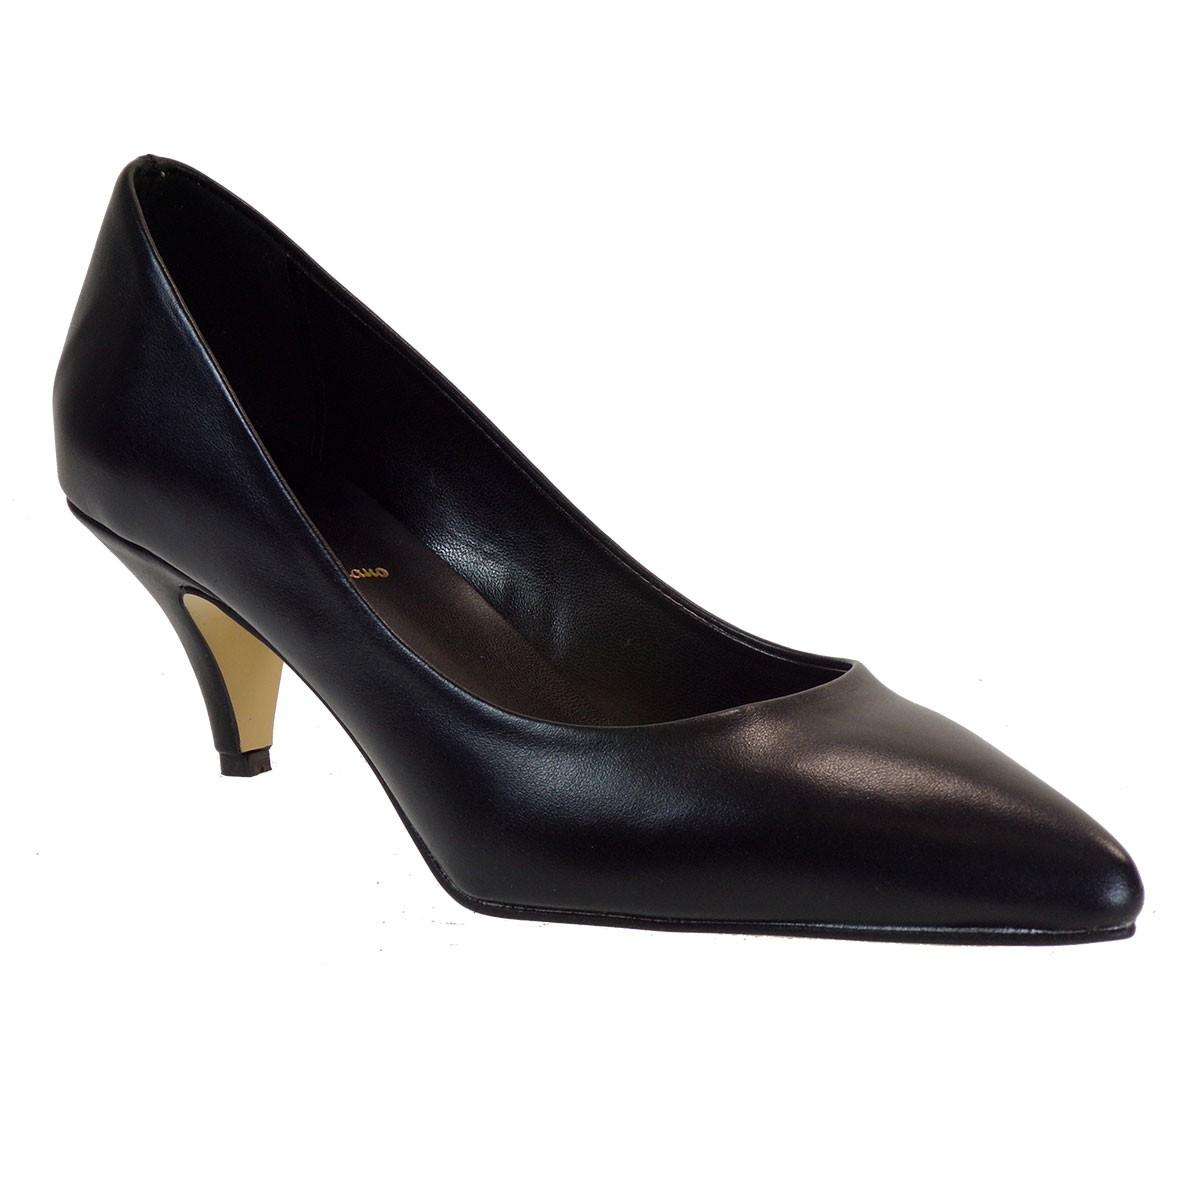 Alessandra Paggioti Γυναικεία Παπούτσια Γόβες 84001 Μαύρο Δέρμα